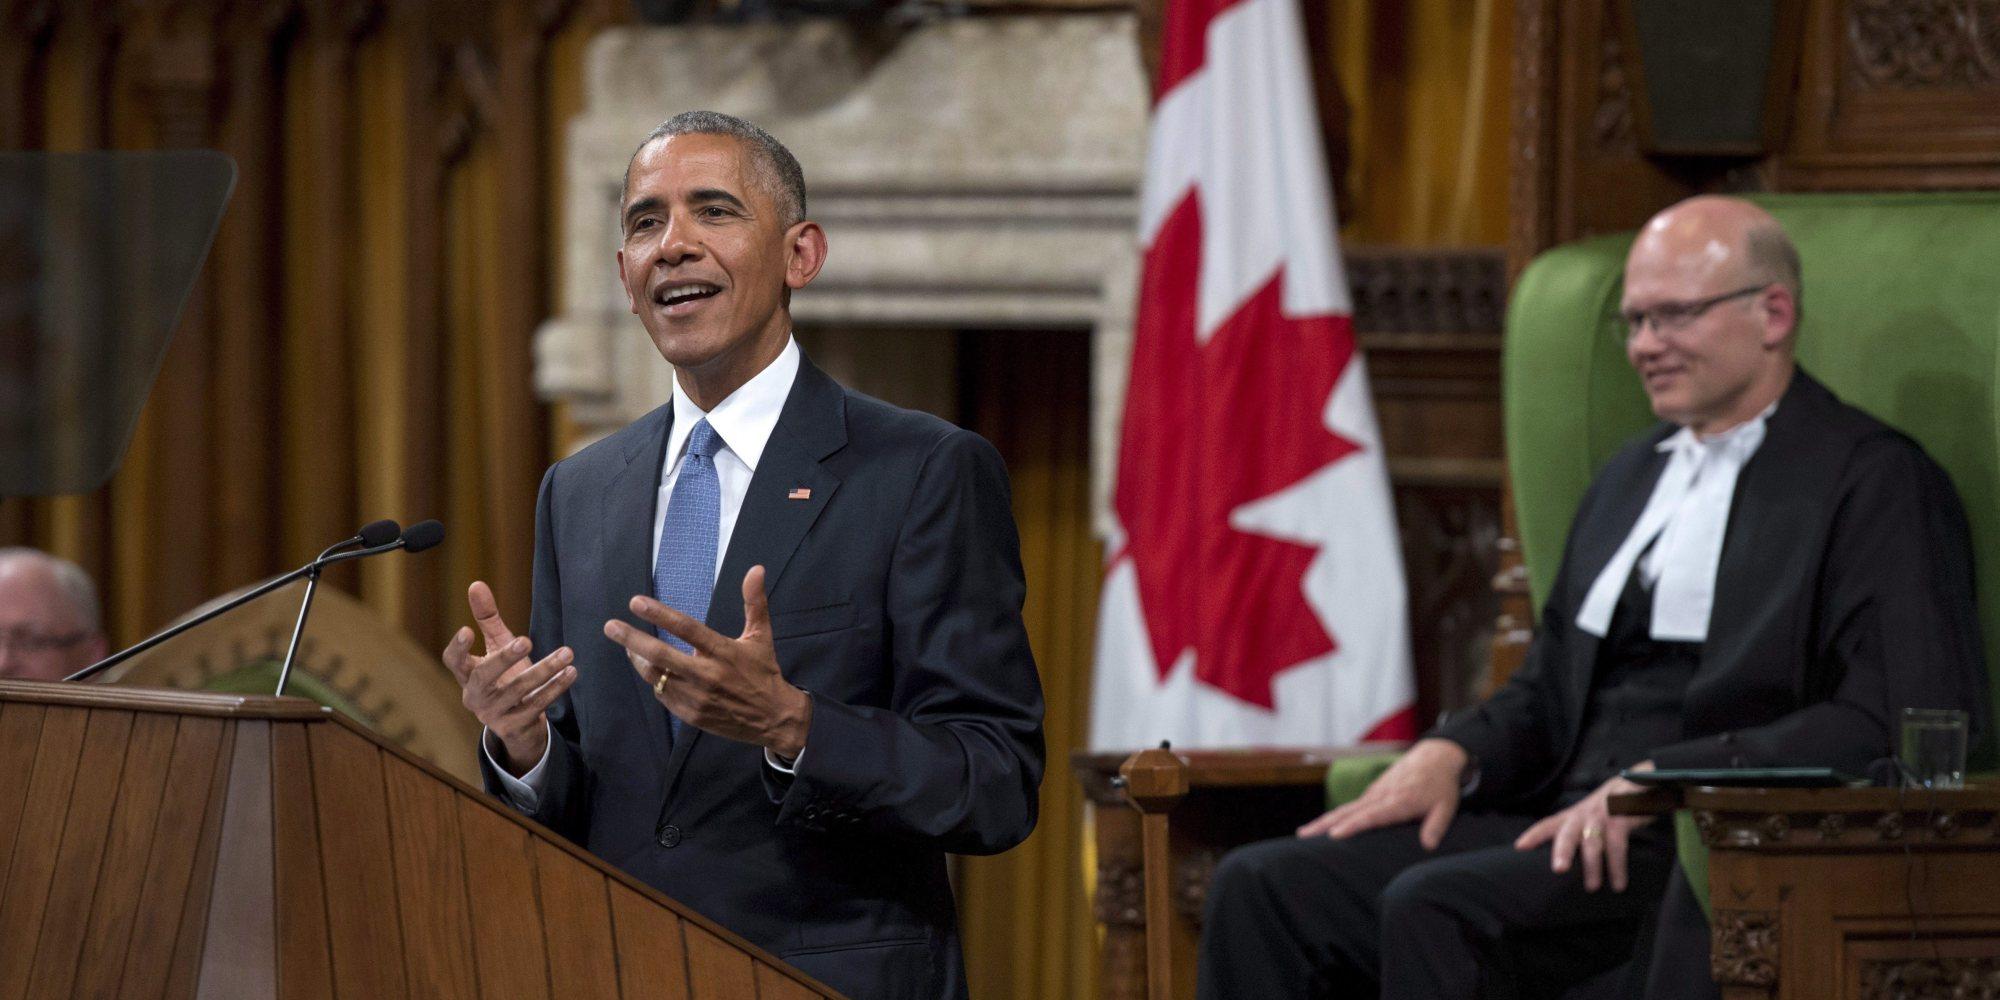 presidential term limits, Barack Obama, Canada